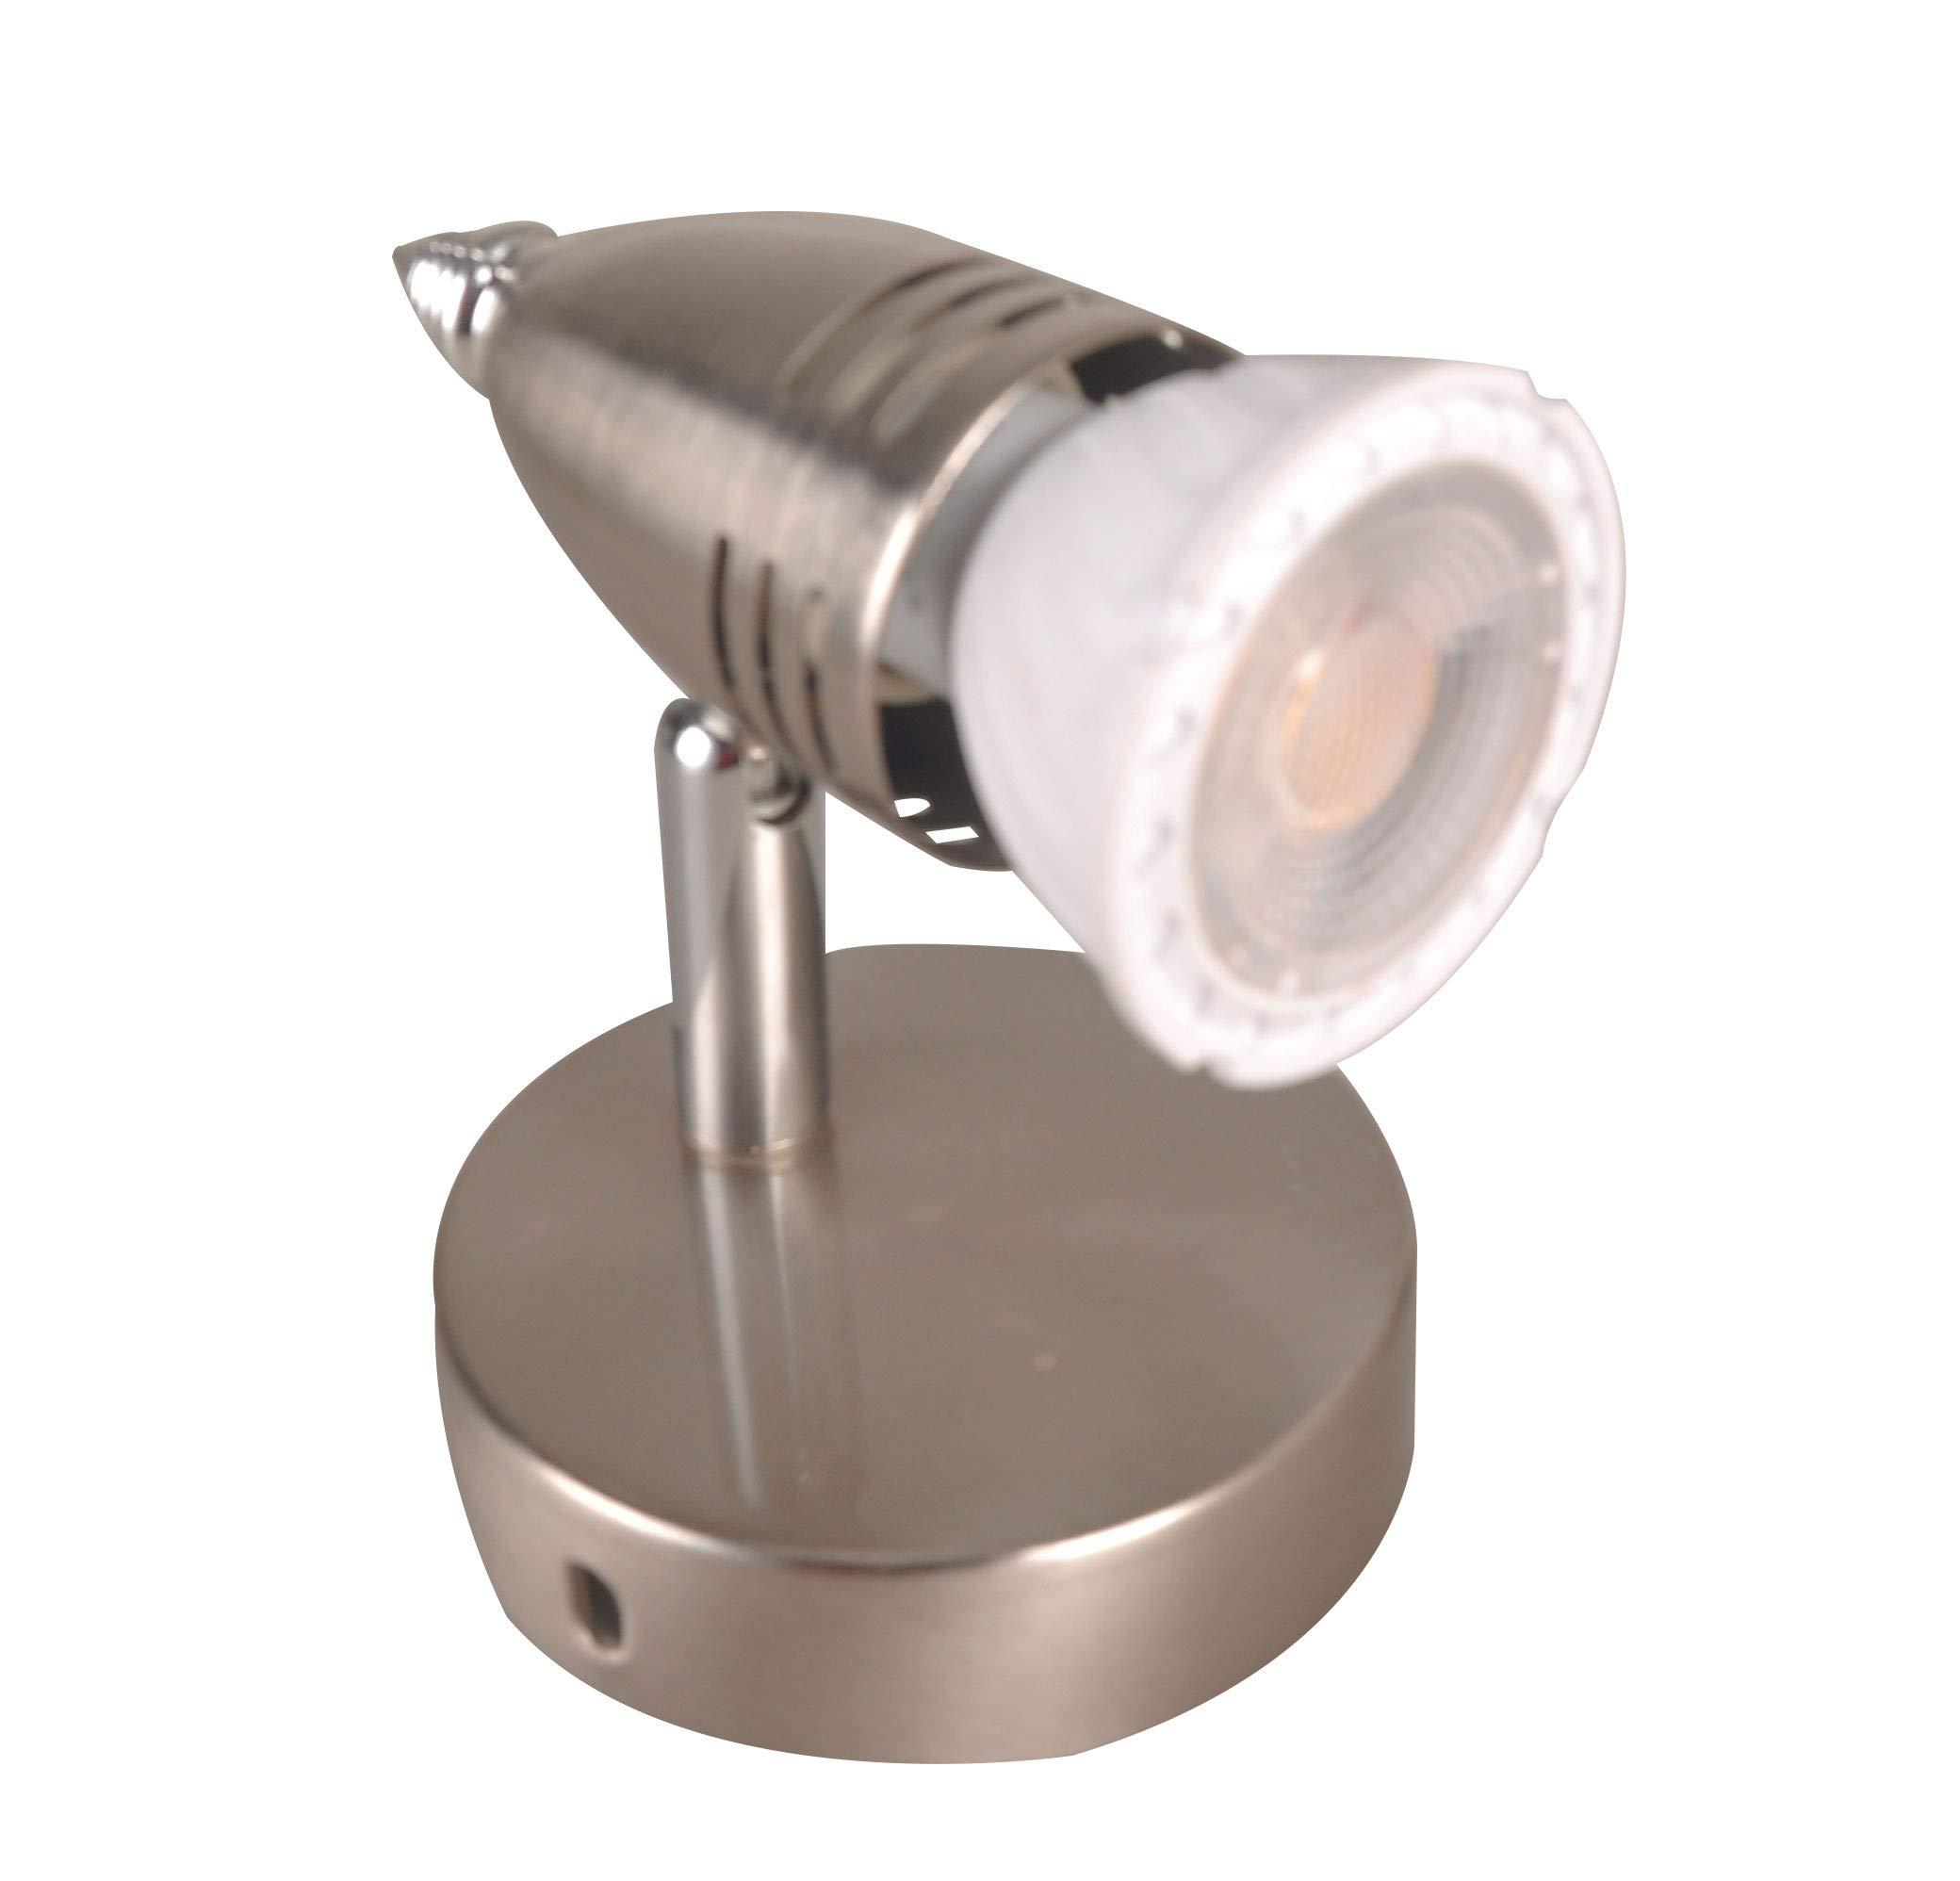 KIMYAN Brushed Nickel Spotlight Accent Uplight with MR16GU10 LED Bulb,Warm White,CRI90, Cord-n-Plug